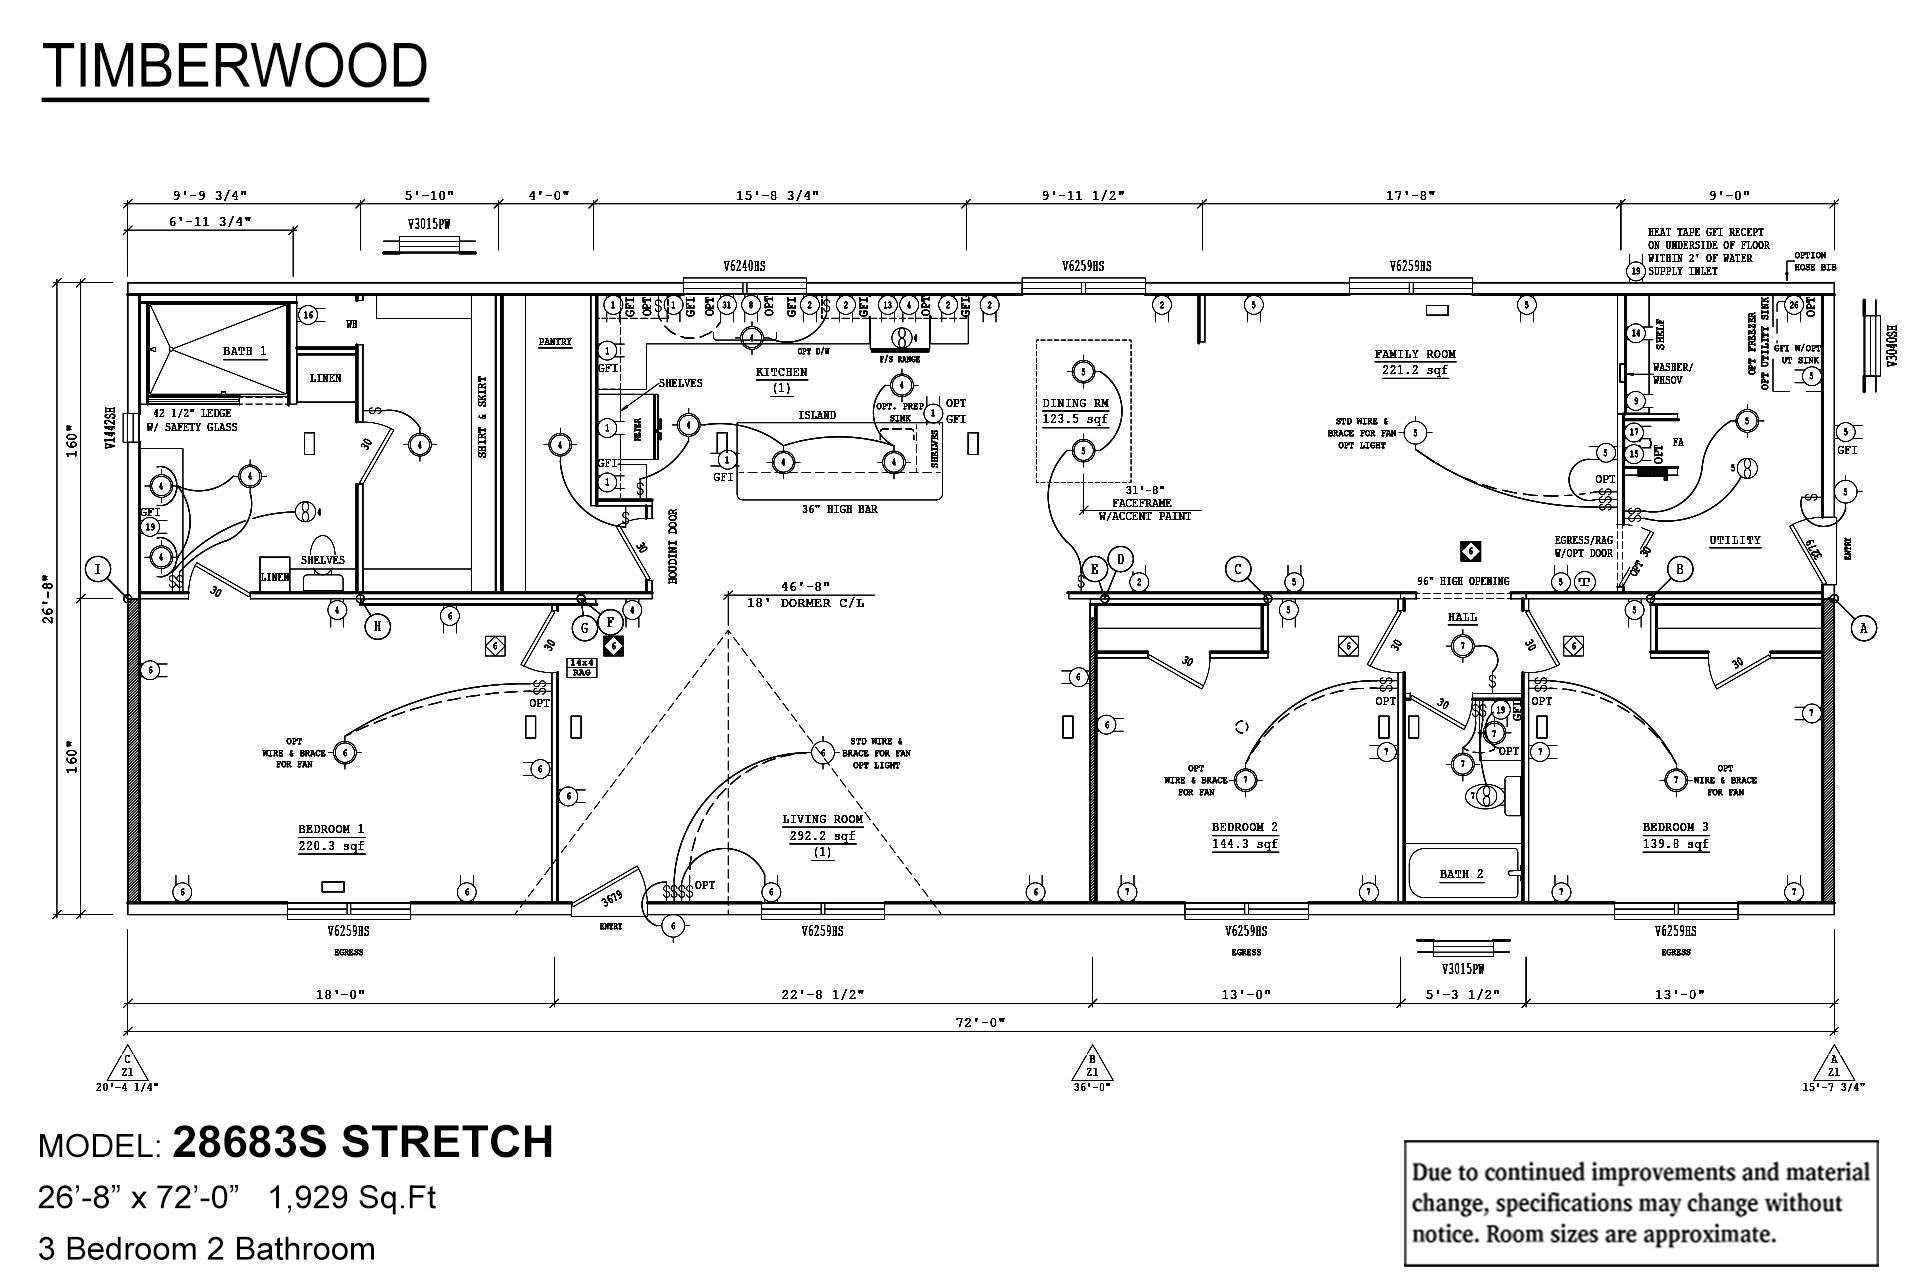 Timberwood 28683S Stretch Layout